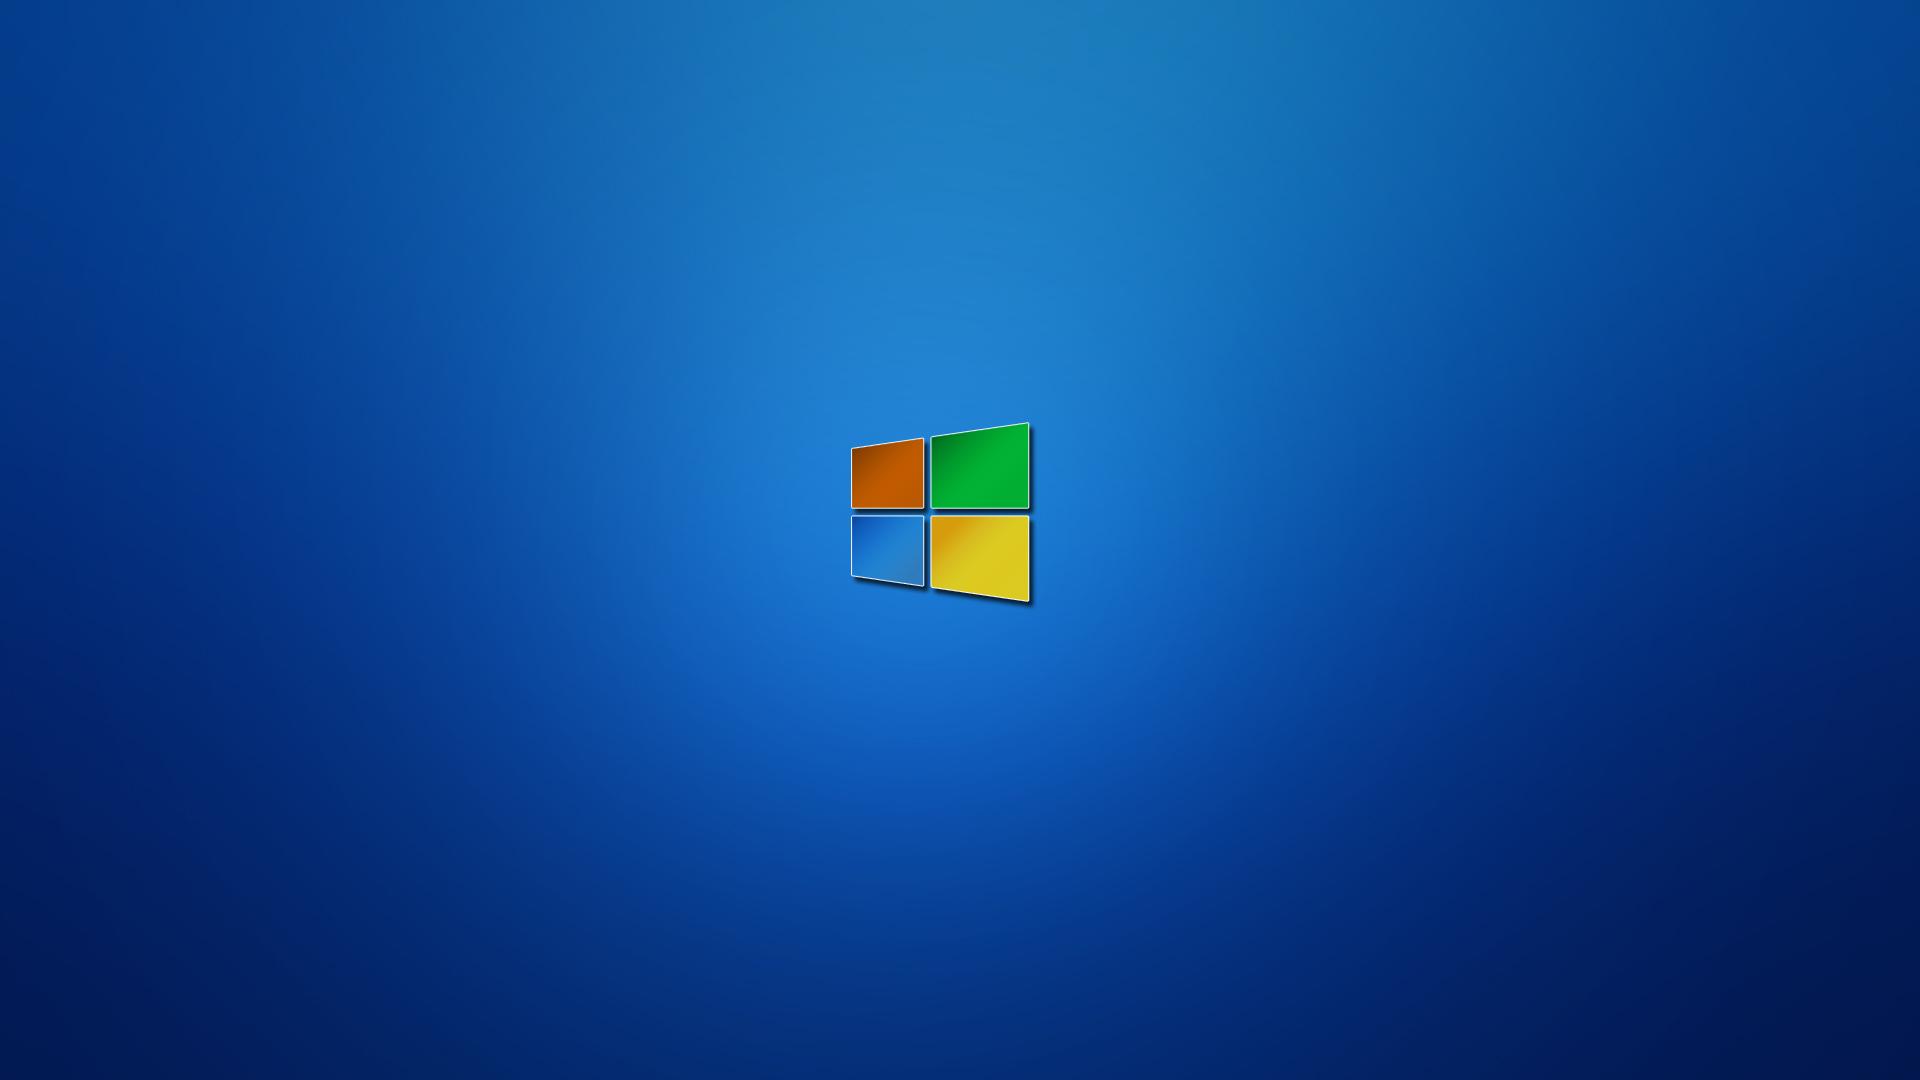 windows 8 metro wallpaper logo by reymond p scene d4q4mrg 1920x1080